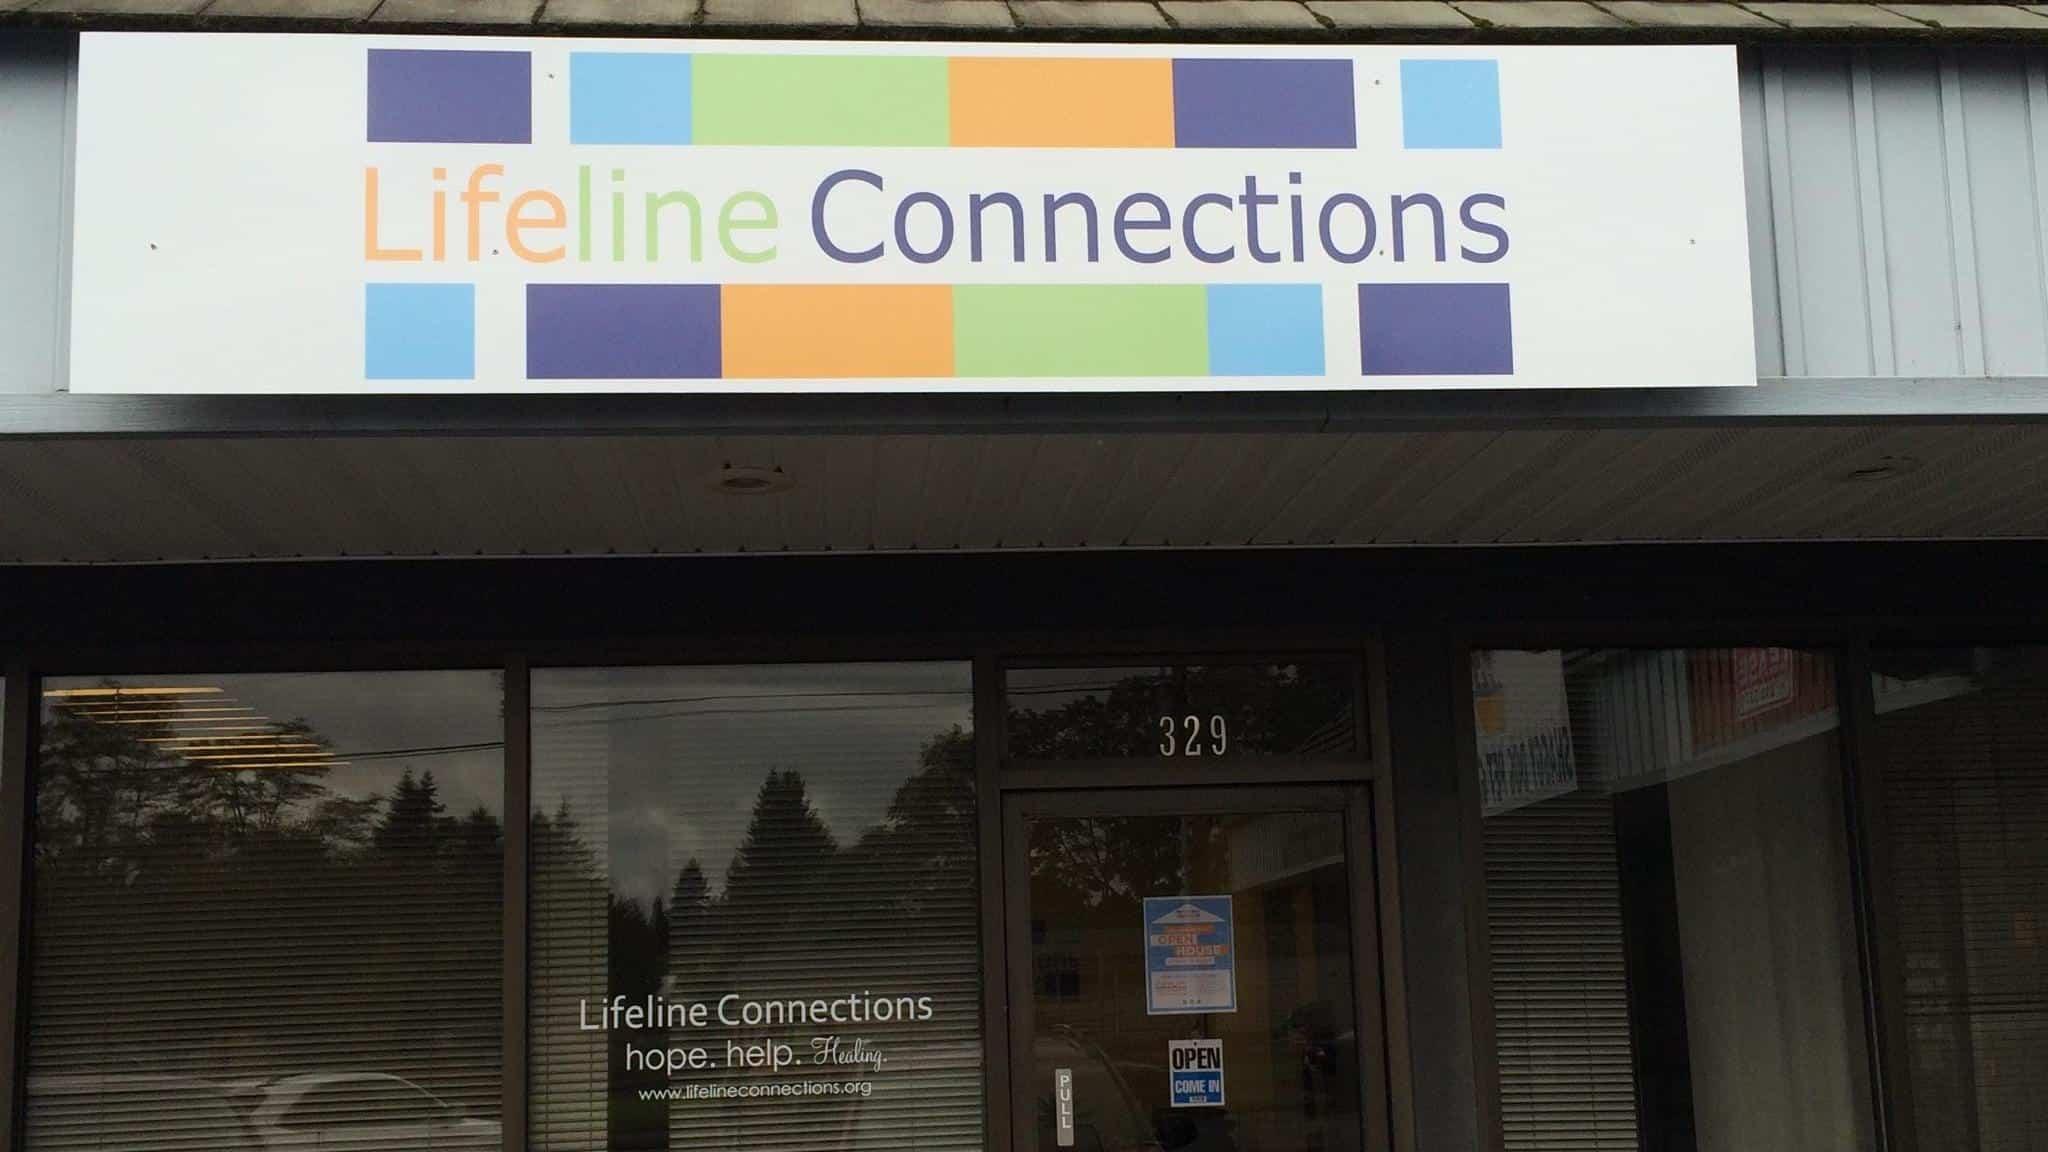 lifeline-connections